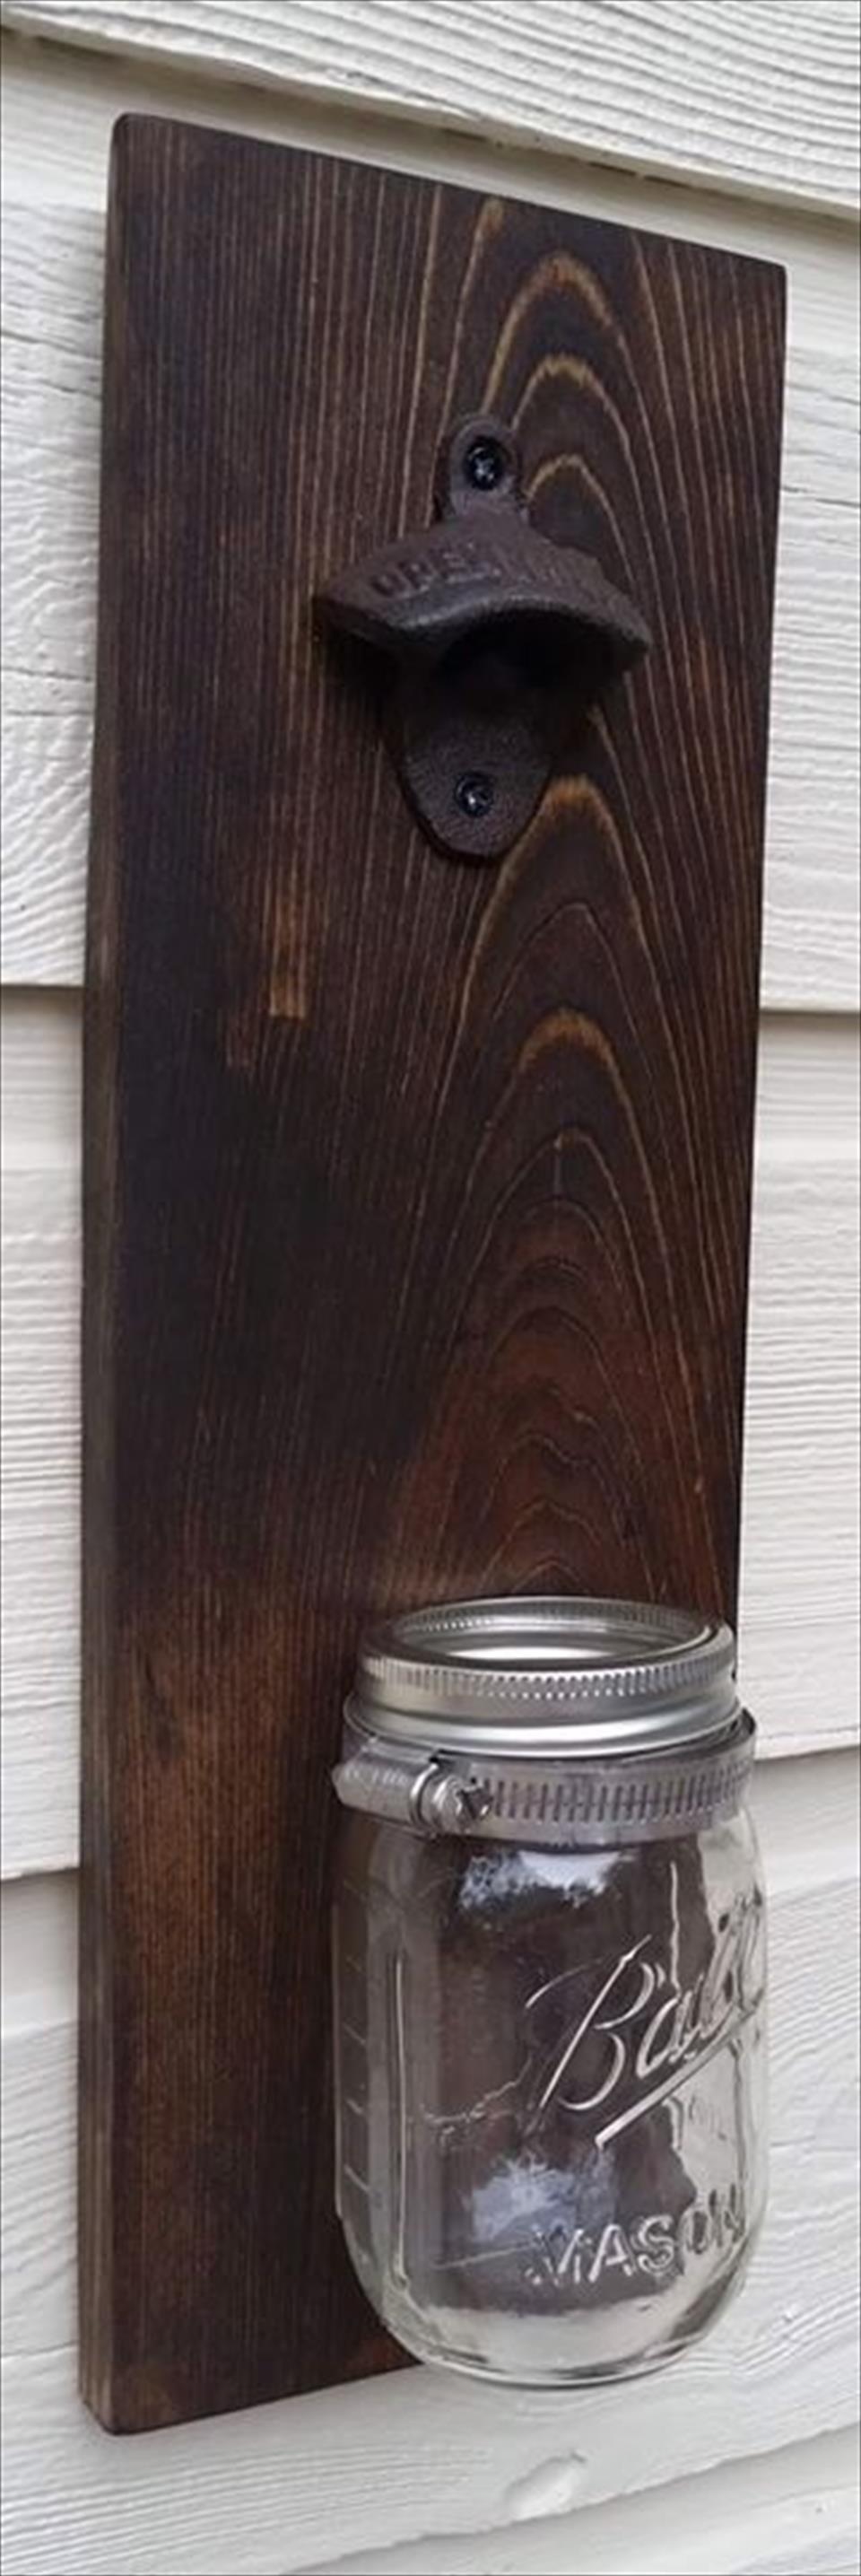 Pallet Bottle Opener with Mason Jar | 101 Pallets